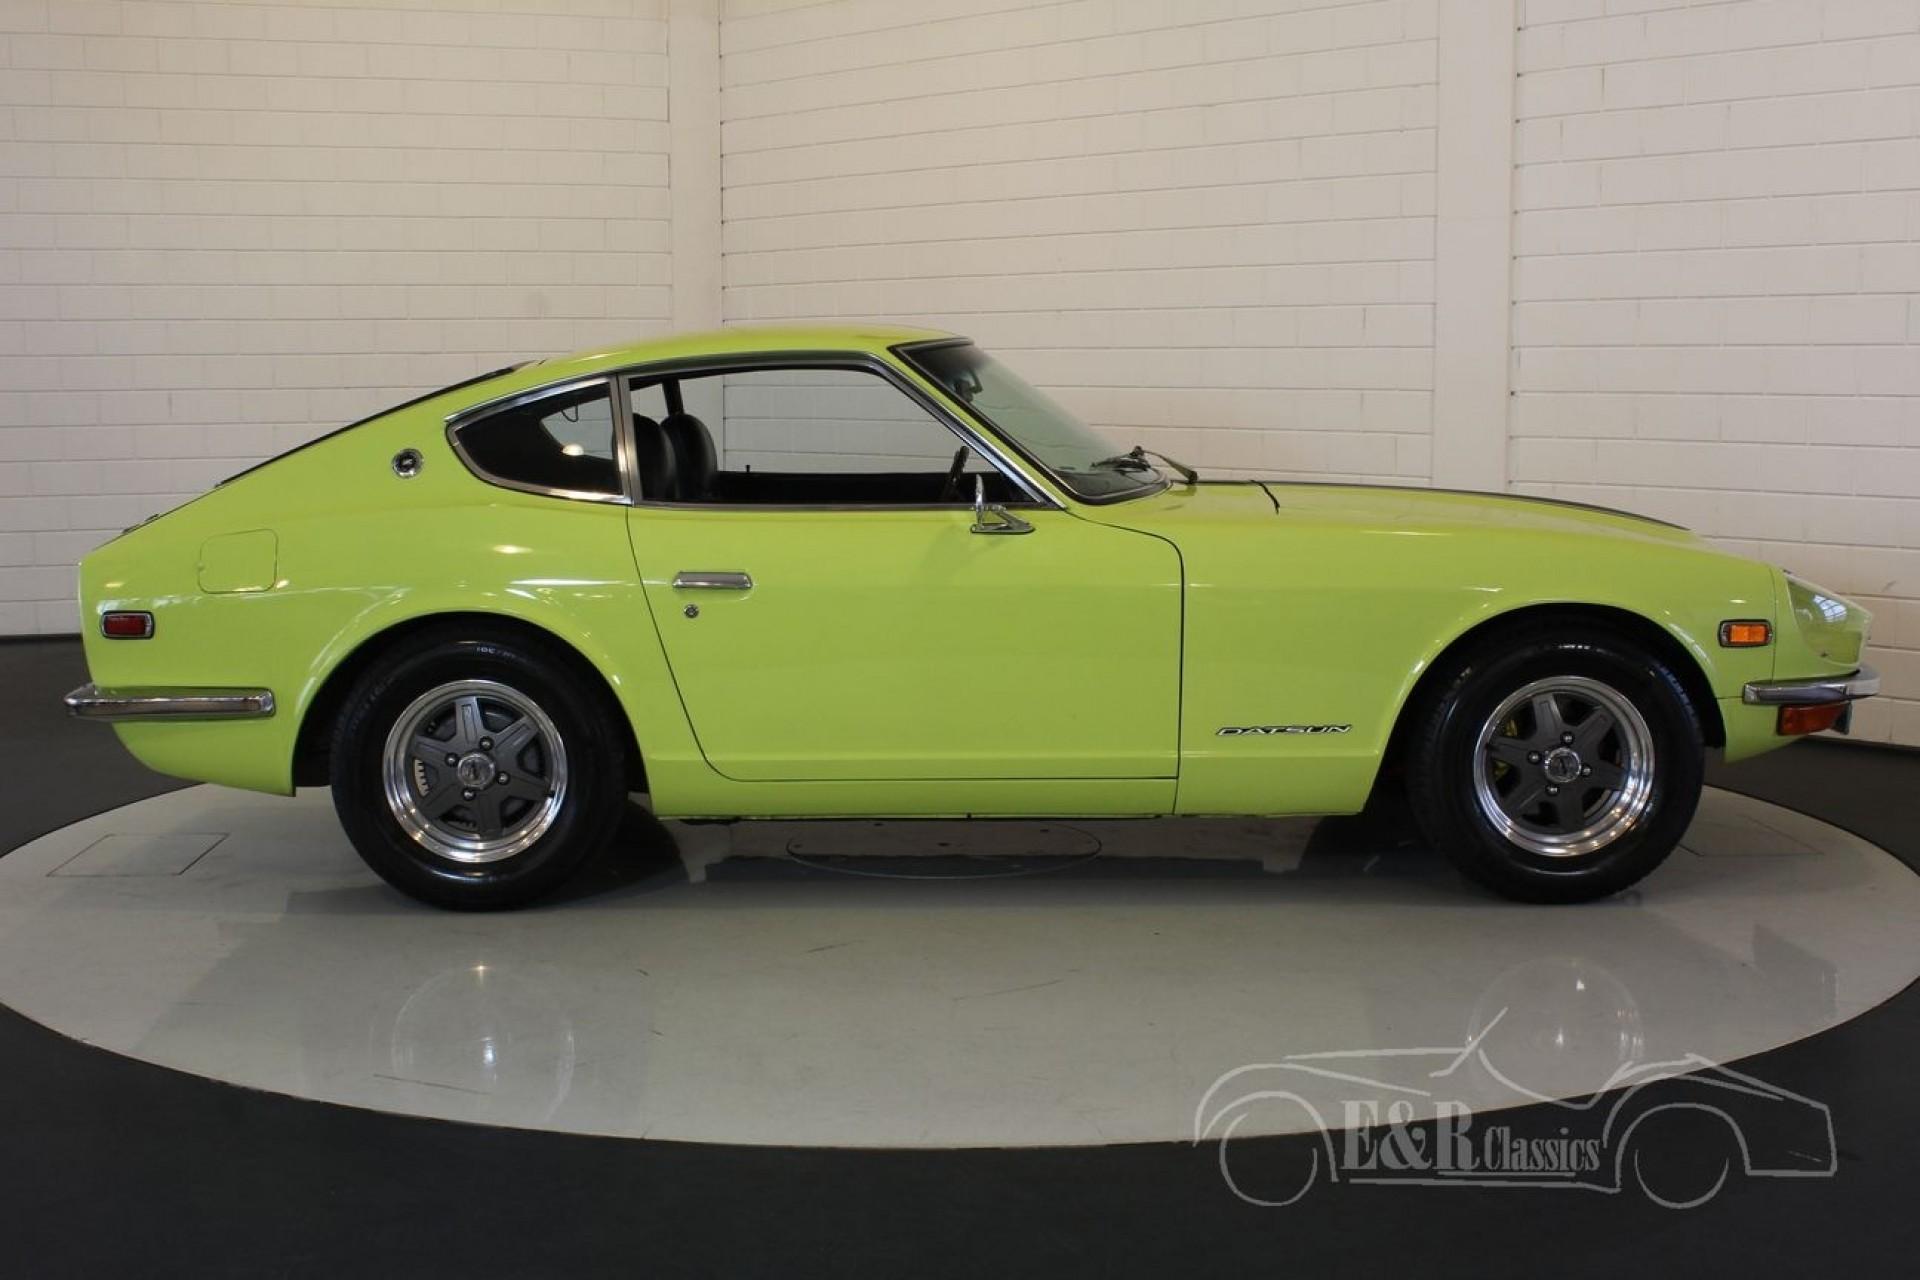 Datsun 240z Coupe 1972 For Sale At Erclassics